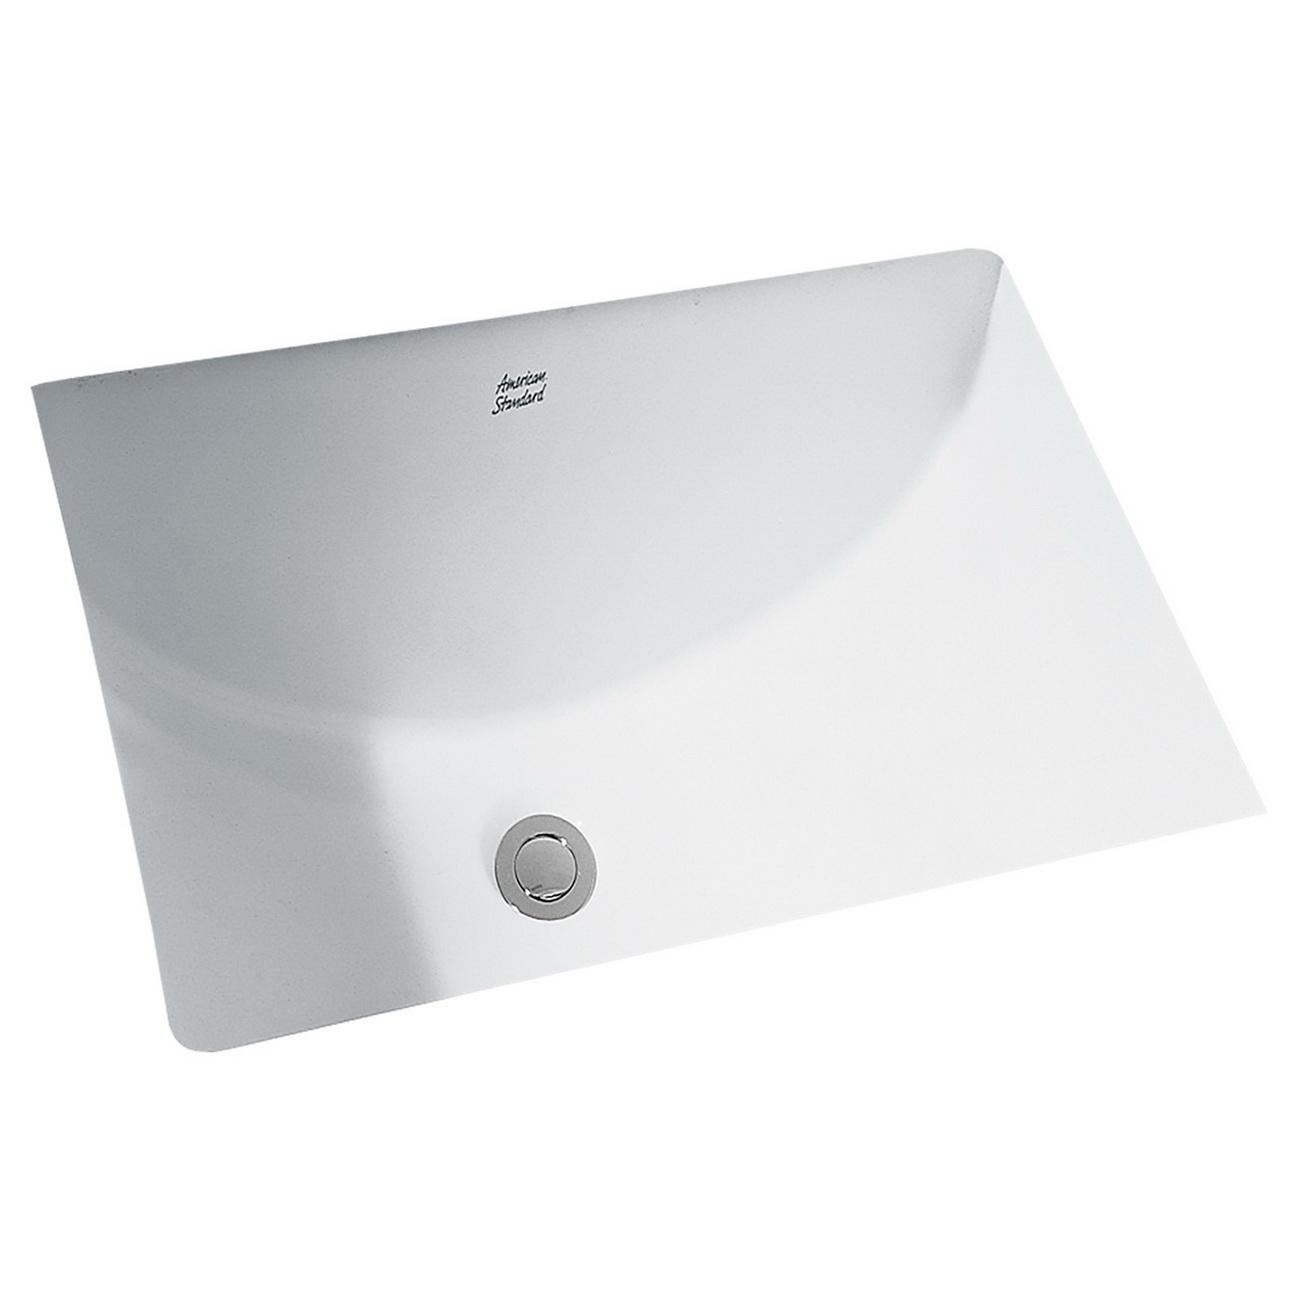 American Standard Studio™ 0614.000.020 White Vitreous China Under Mount Undercounter Sink, 1-Bowl